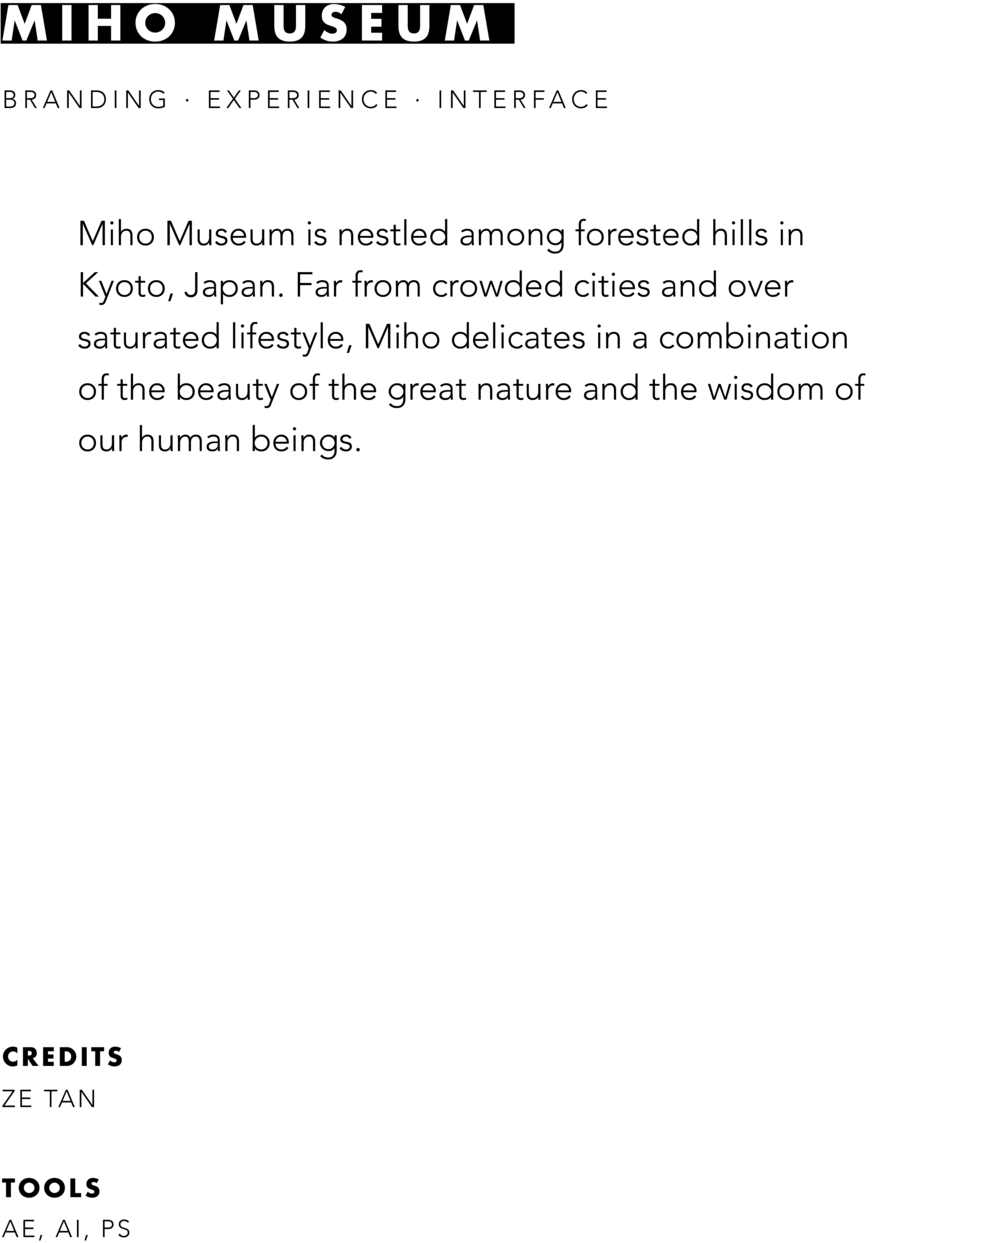 MIHO-02.png